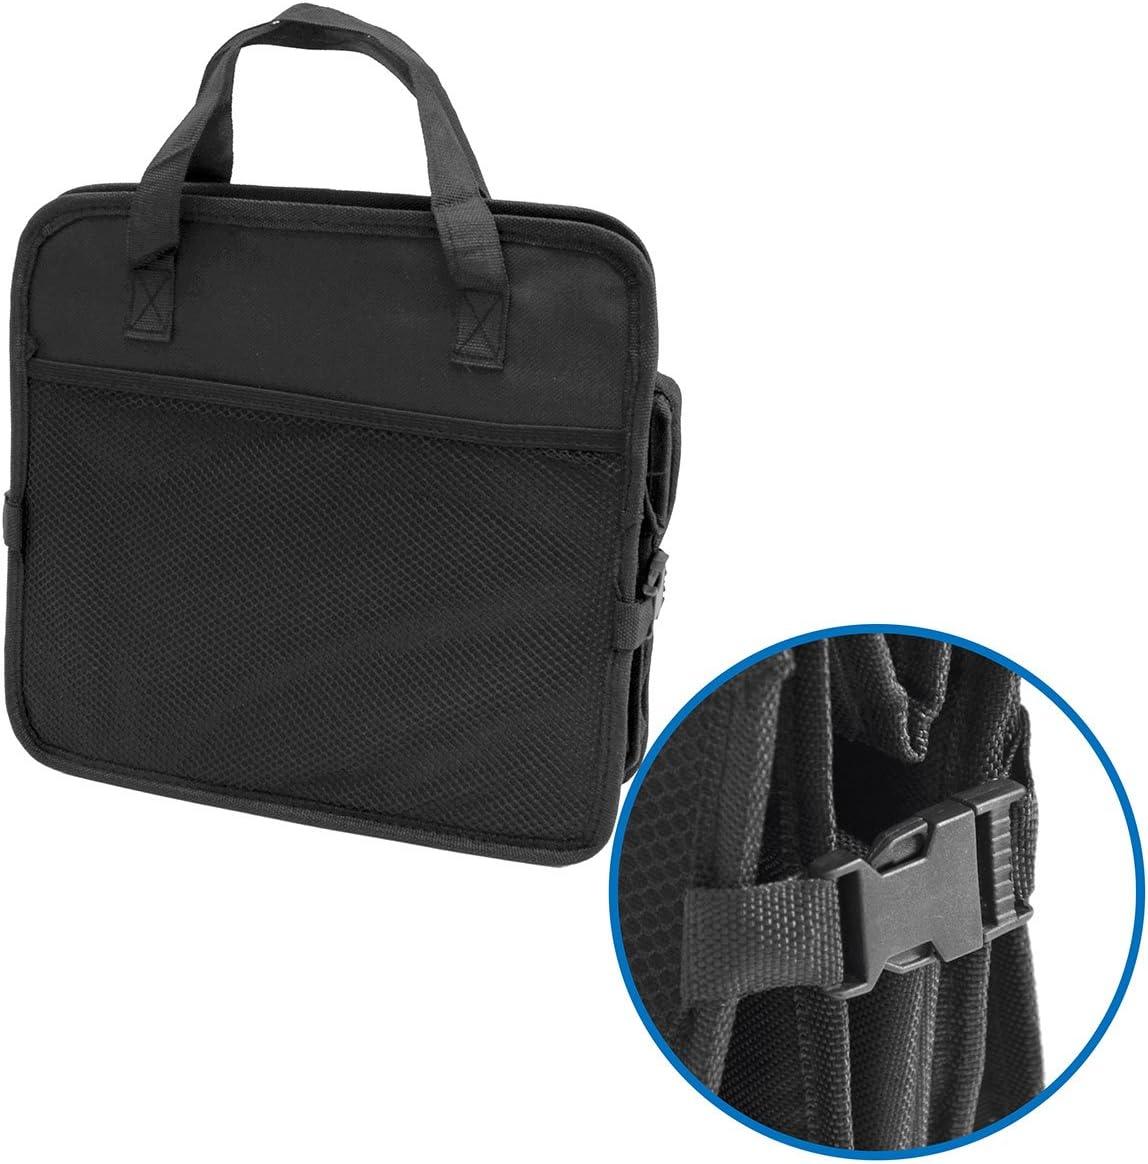 eyepower Car Boot Bag 60x32x29cm folding storage box with cooler Black